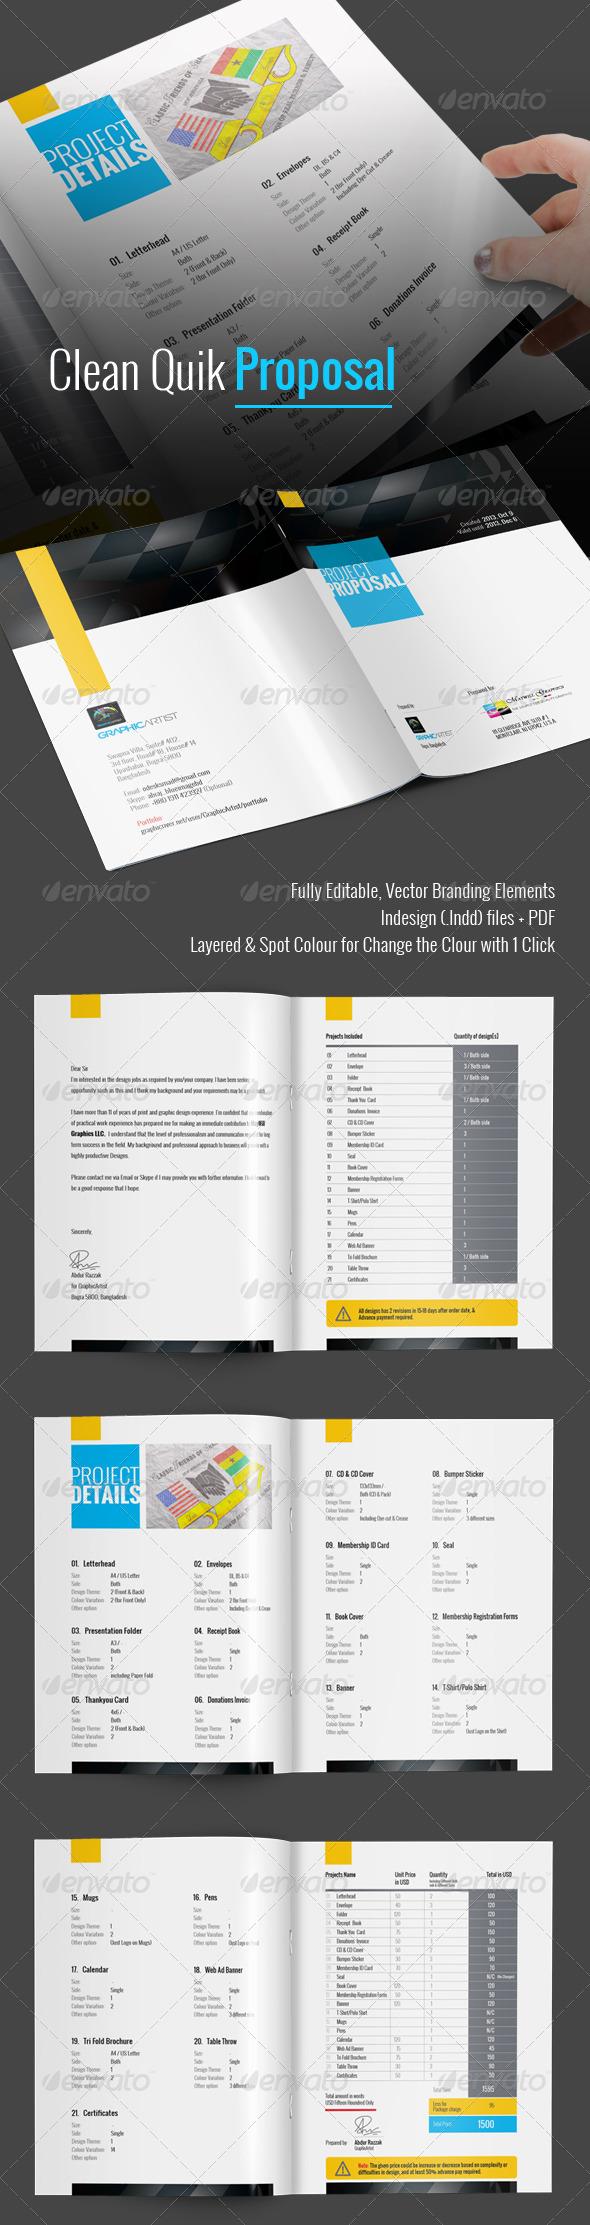 GraphicRiver Clean Quik Proposal 6845116